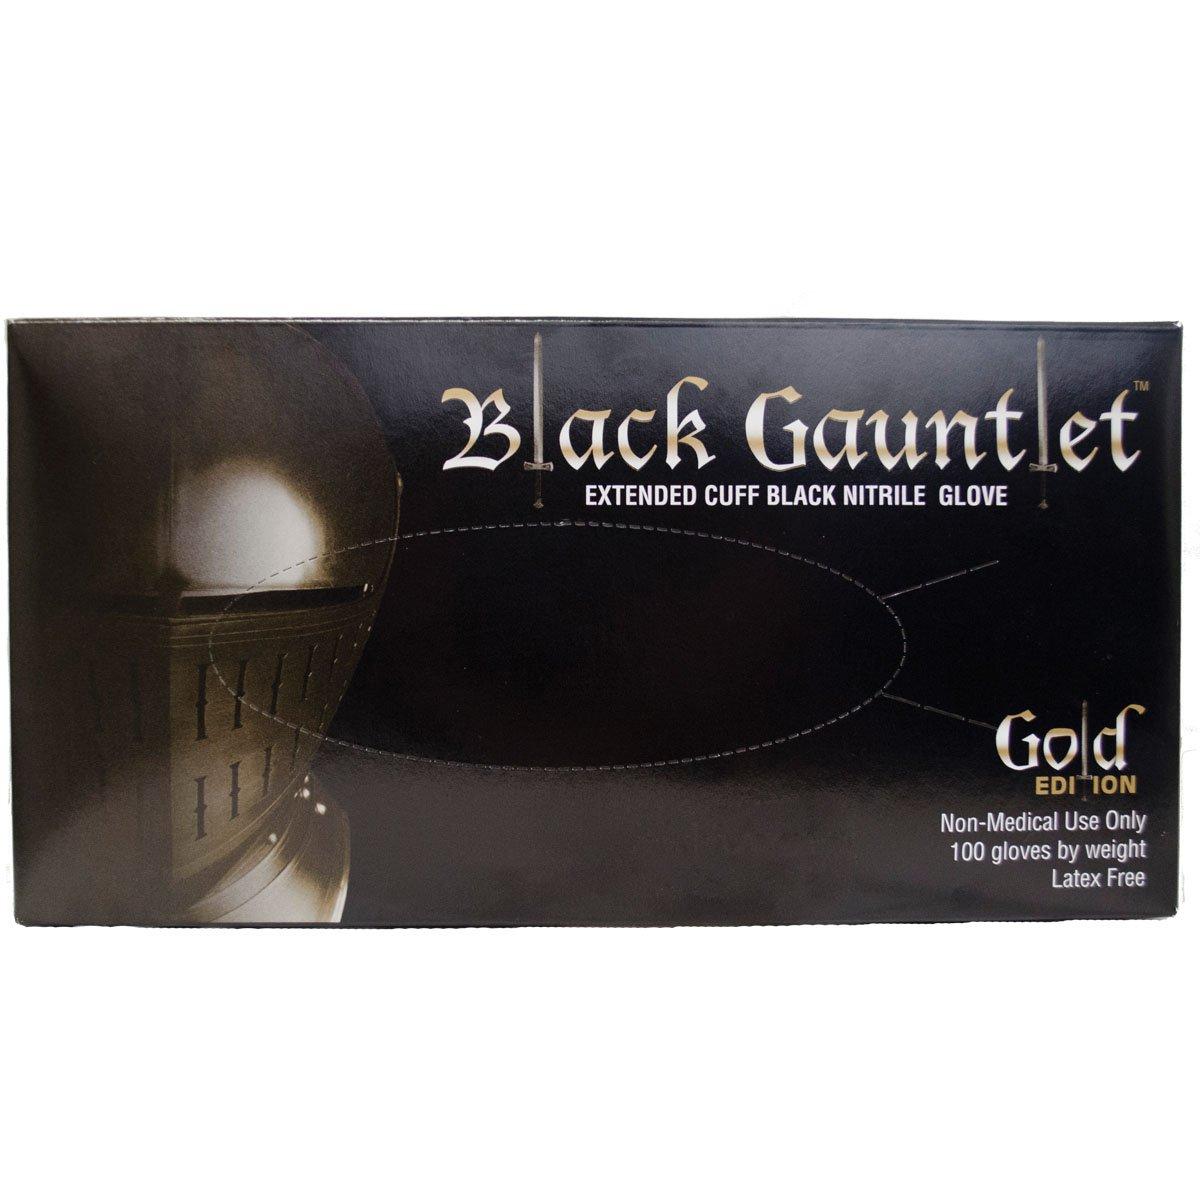 ShuBee Black Gauntlet Gold Edition Black Nitrile Glove XX Large